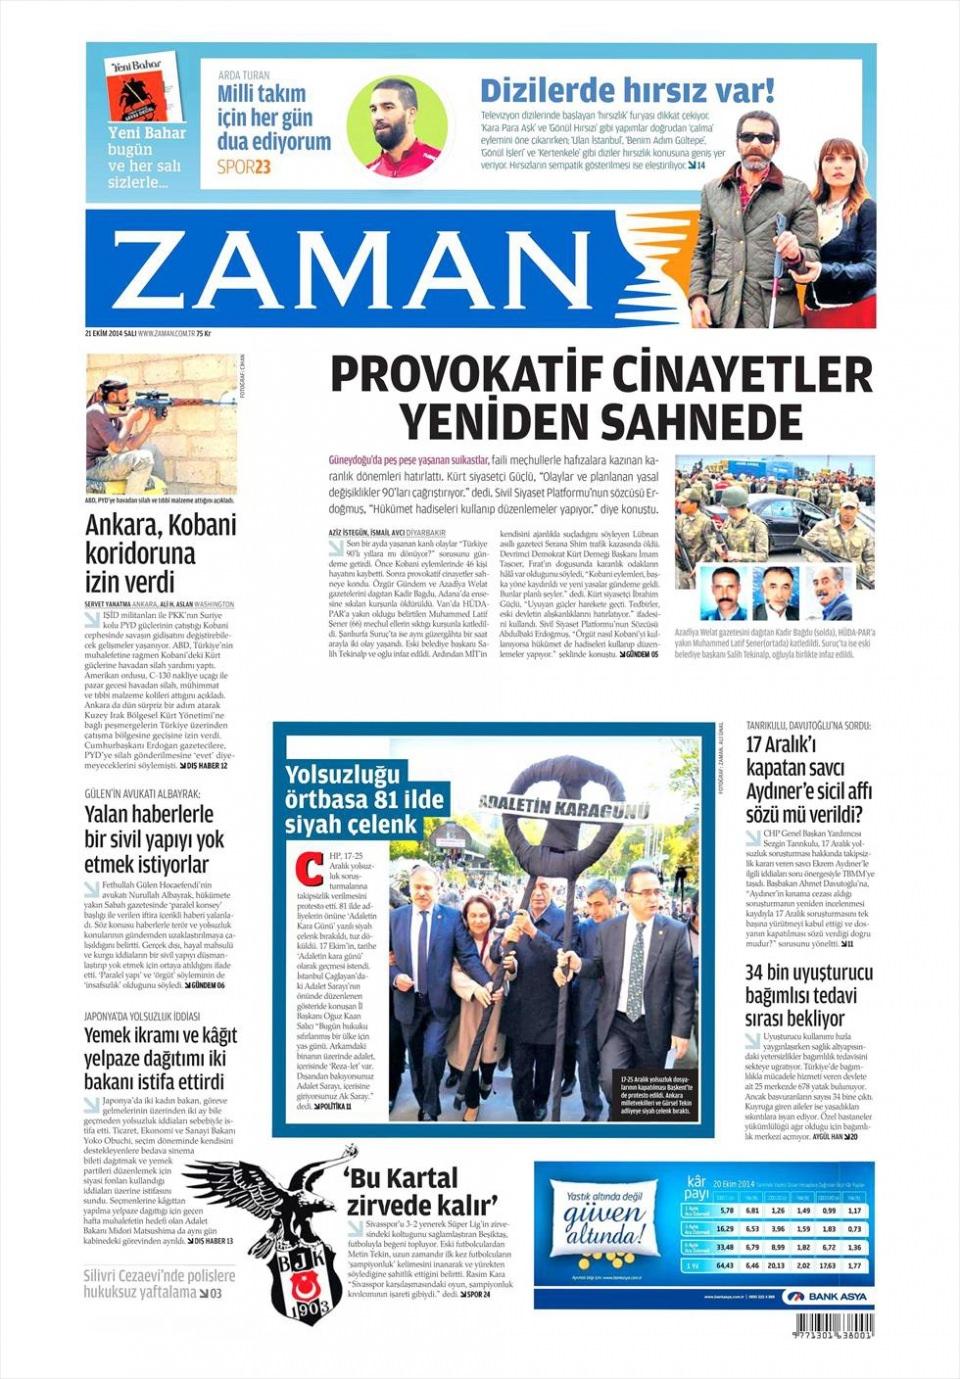 21 Ekim 2014 gazete manşetleri 24